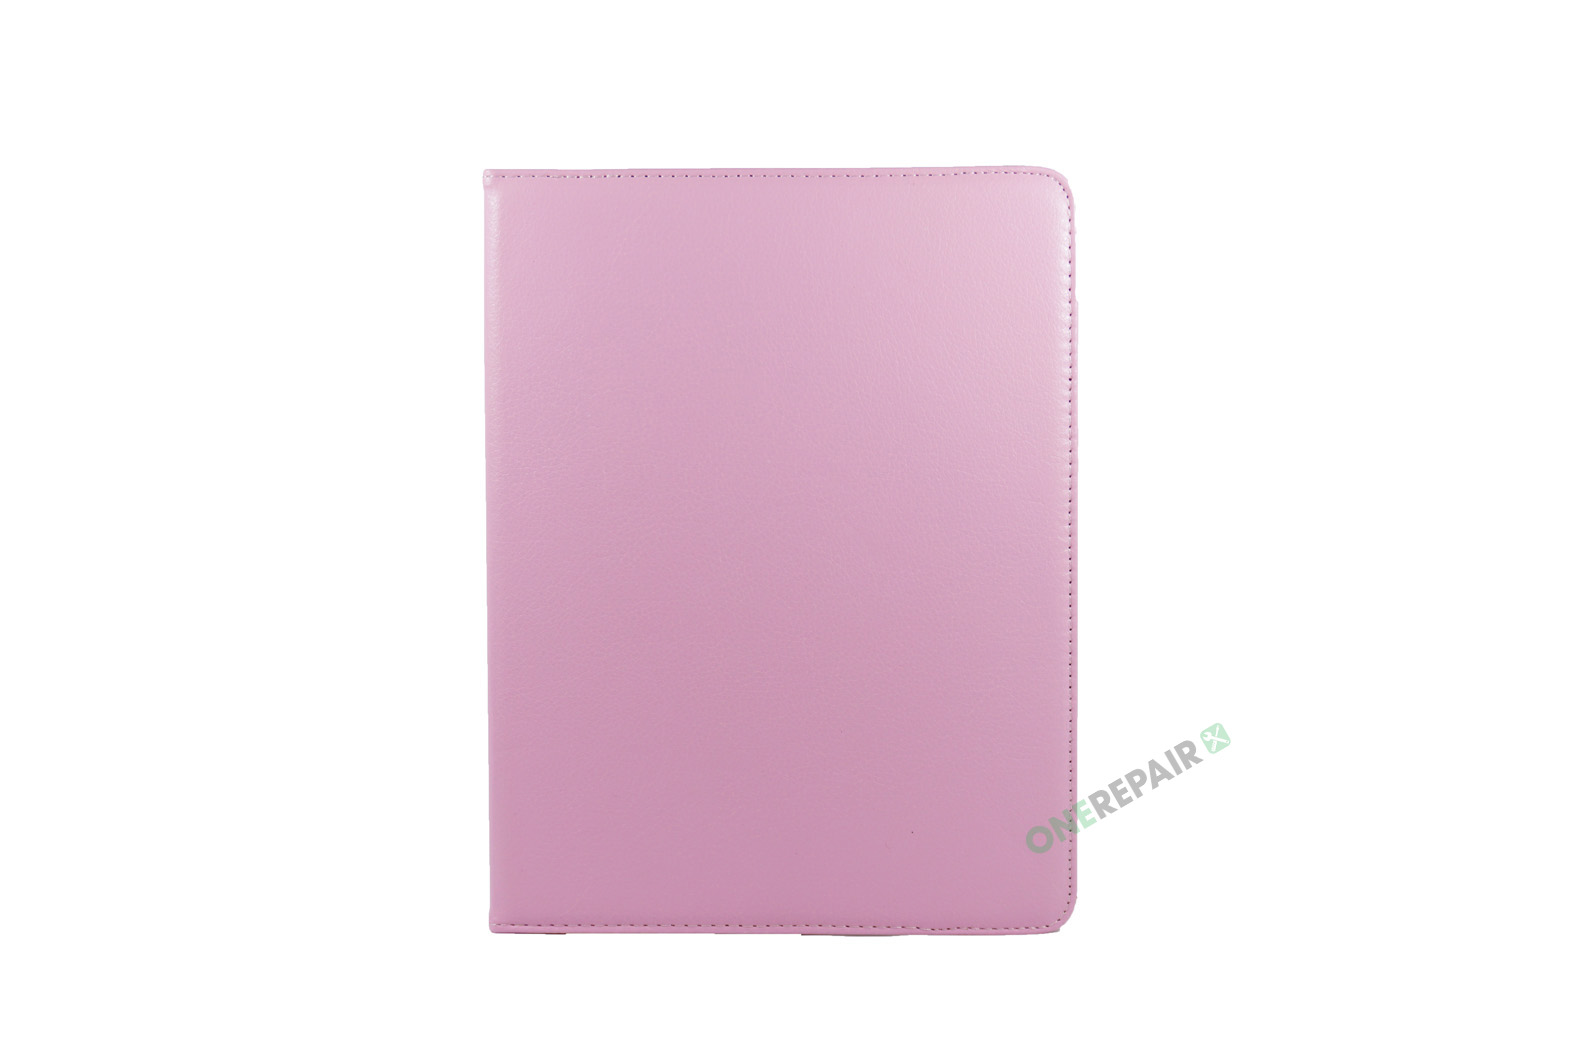 351033_iPad_2_3_4_A1395_A1396_A1430_A1403_1458_A1459_A1460_A1397_Flipcover_Classic_360_Cover_Lyseroed_Pink_Billig_Godt_Beskyttelse_OneRepair_WM_00002